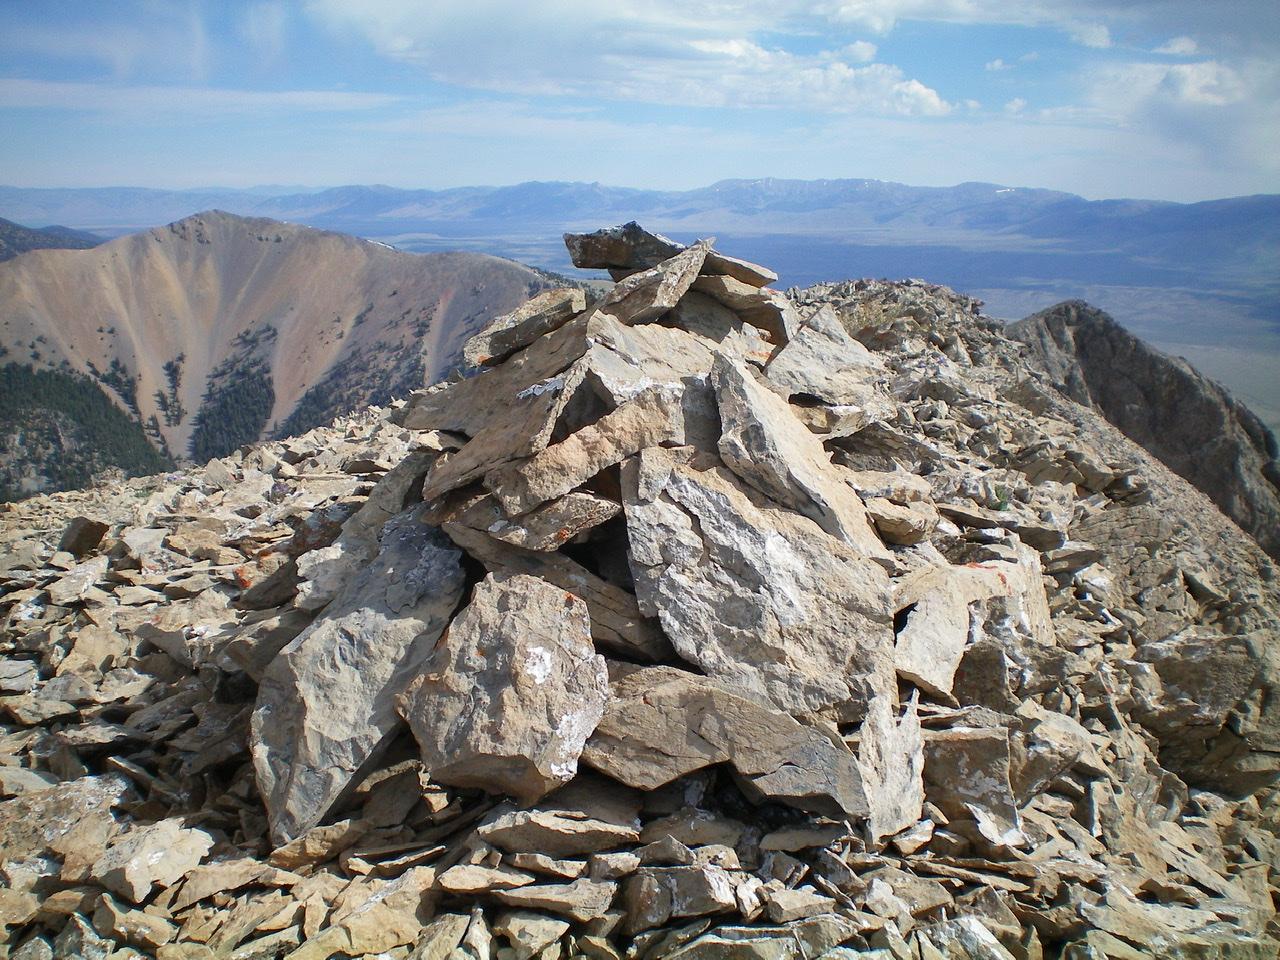 The newly-enhanced summit cairn atop The Knoll. Livingston Douglas Photo